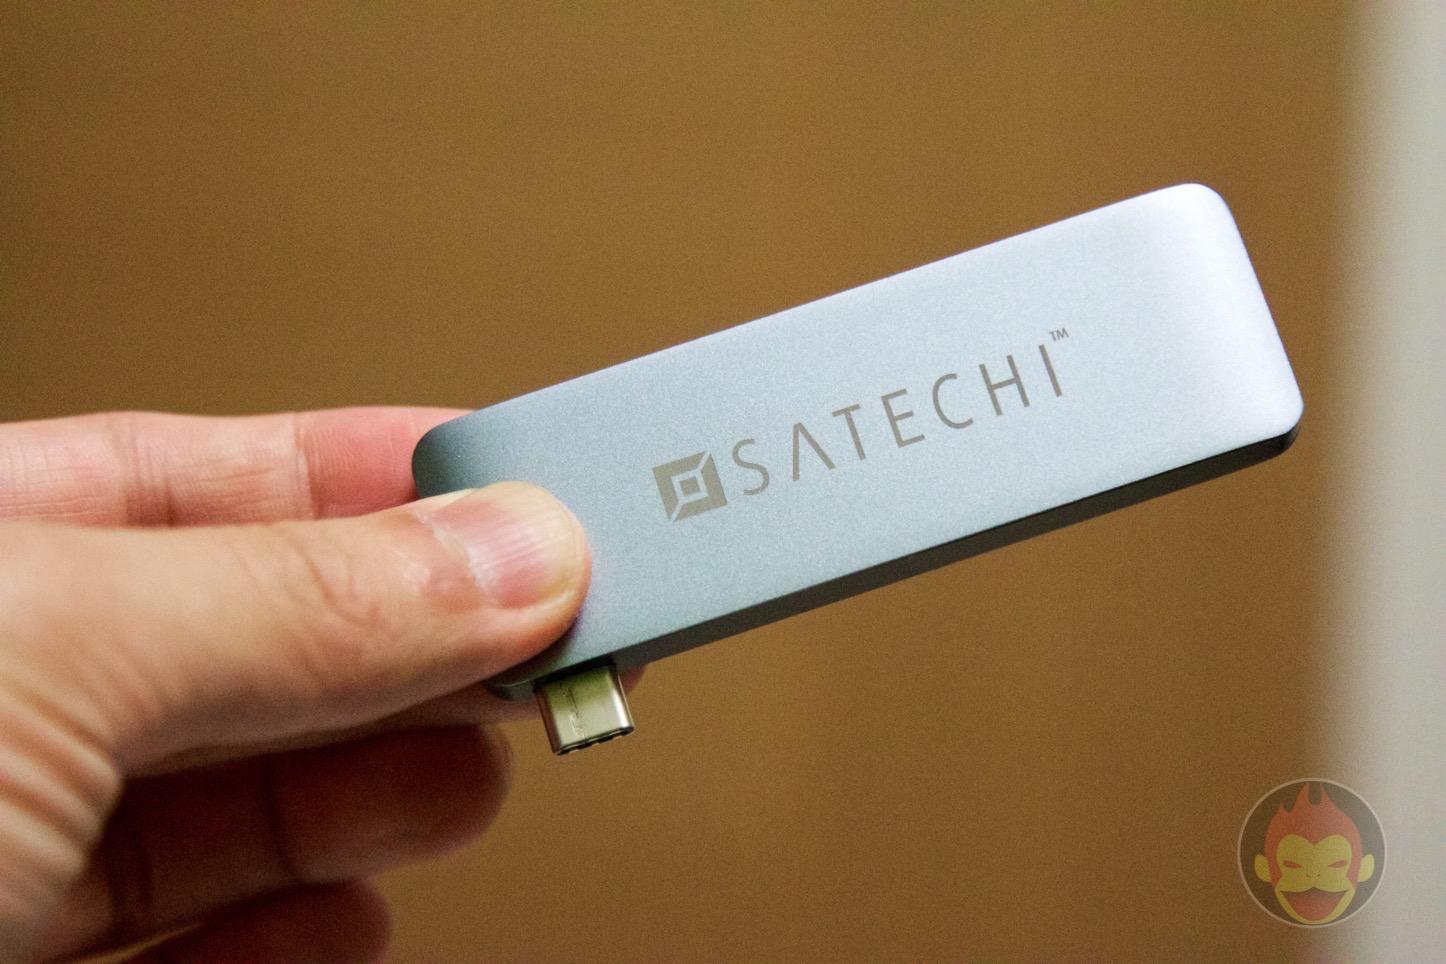 Satechi-MacBook-Type-C-3in1-04.jpg